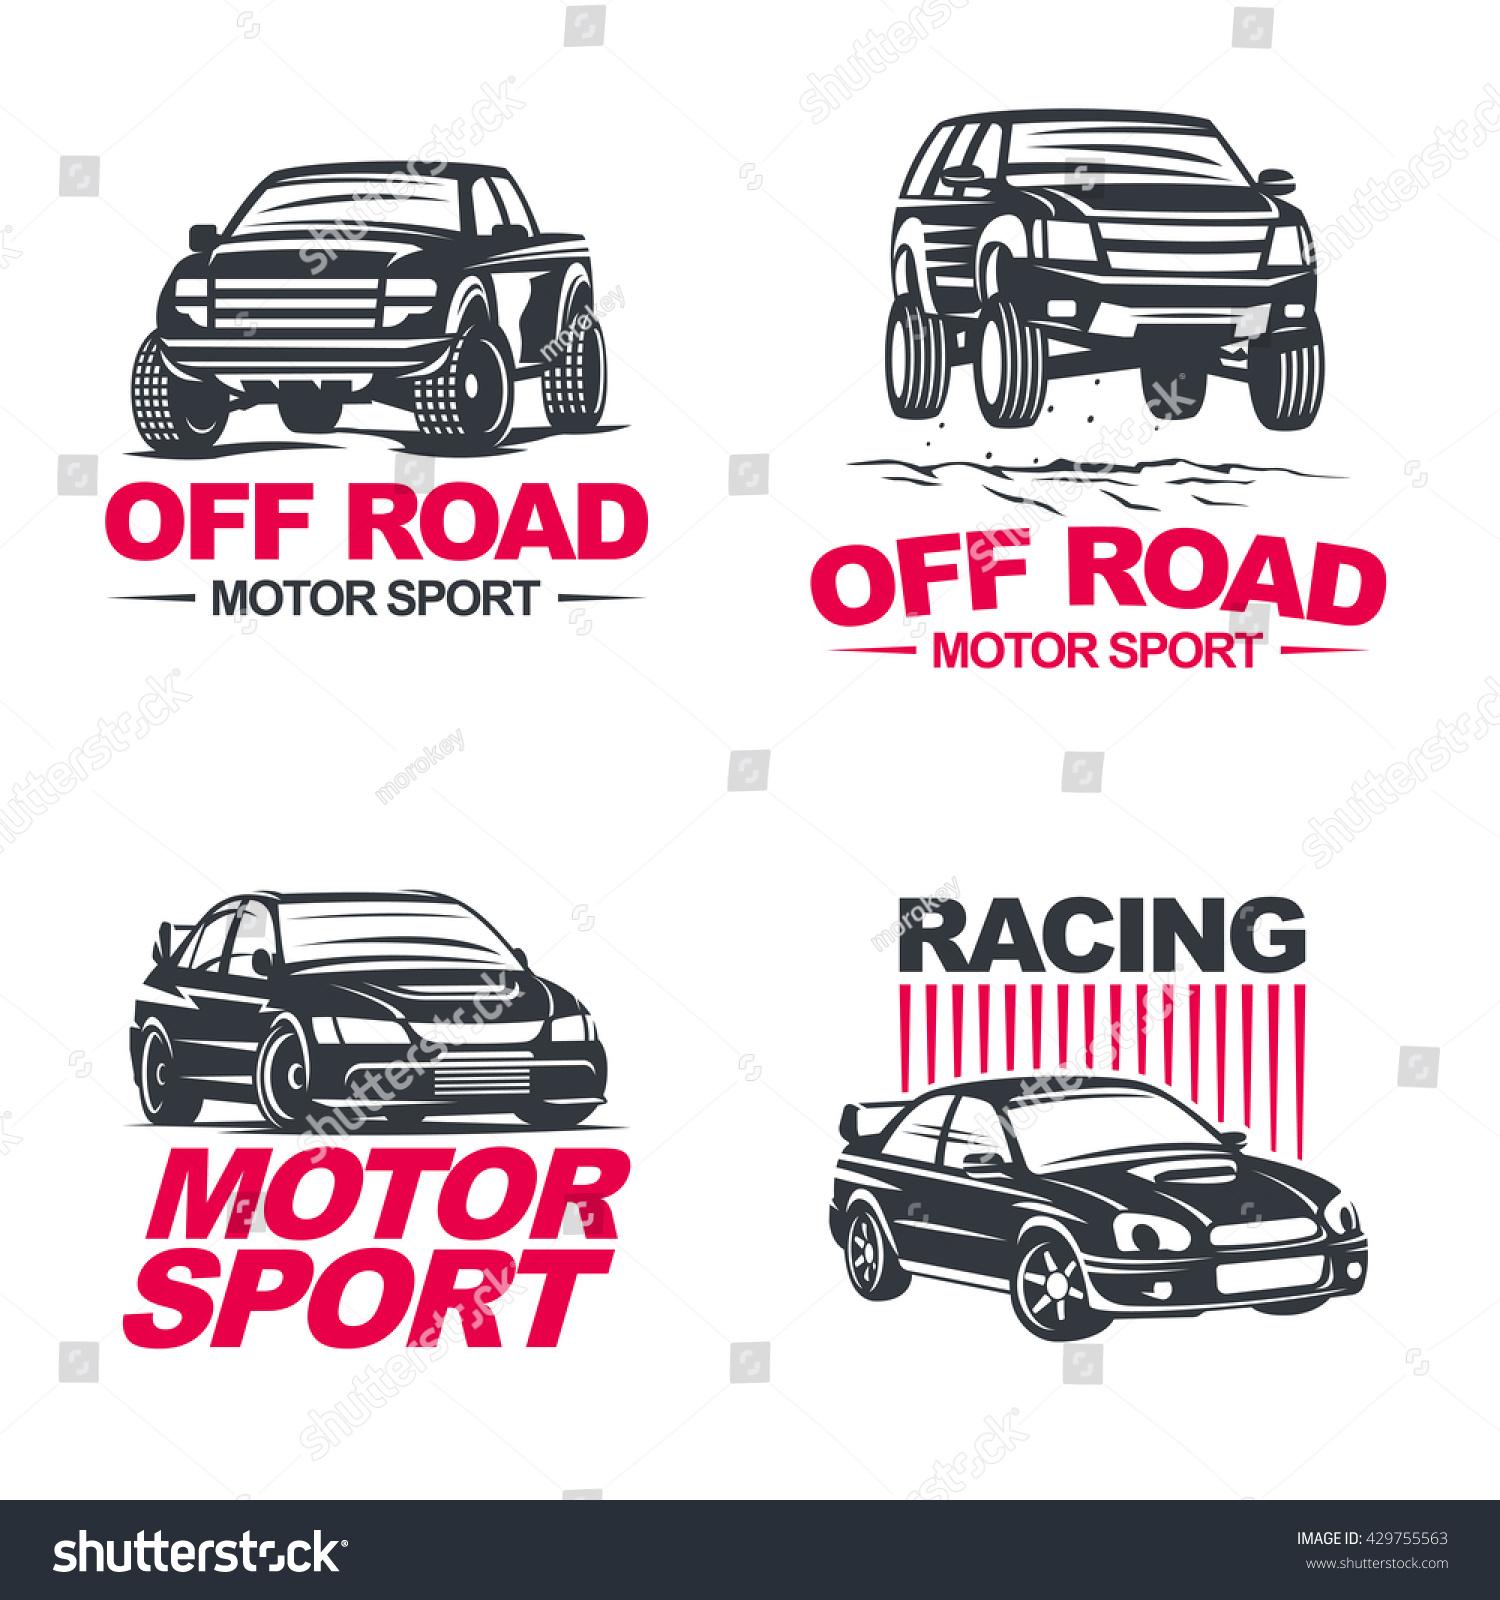 Set of four sport cars logo badge illustration on white background Drag racing Tuning Motor Sport EPS 10